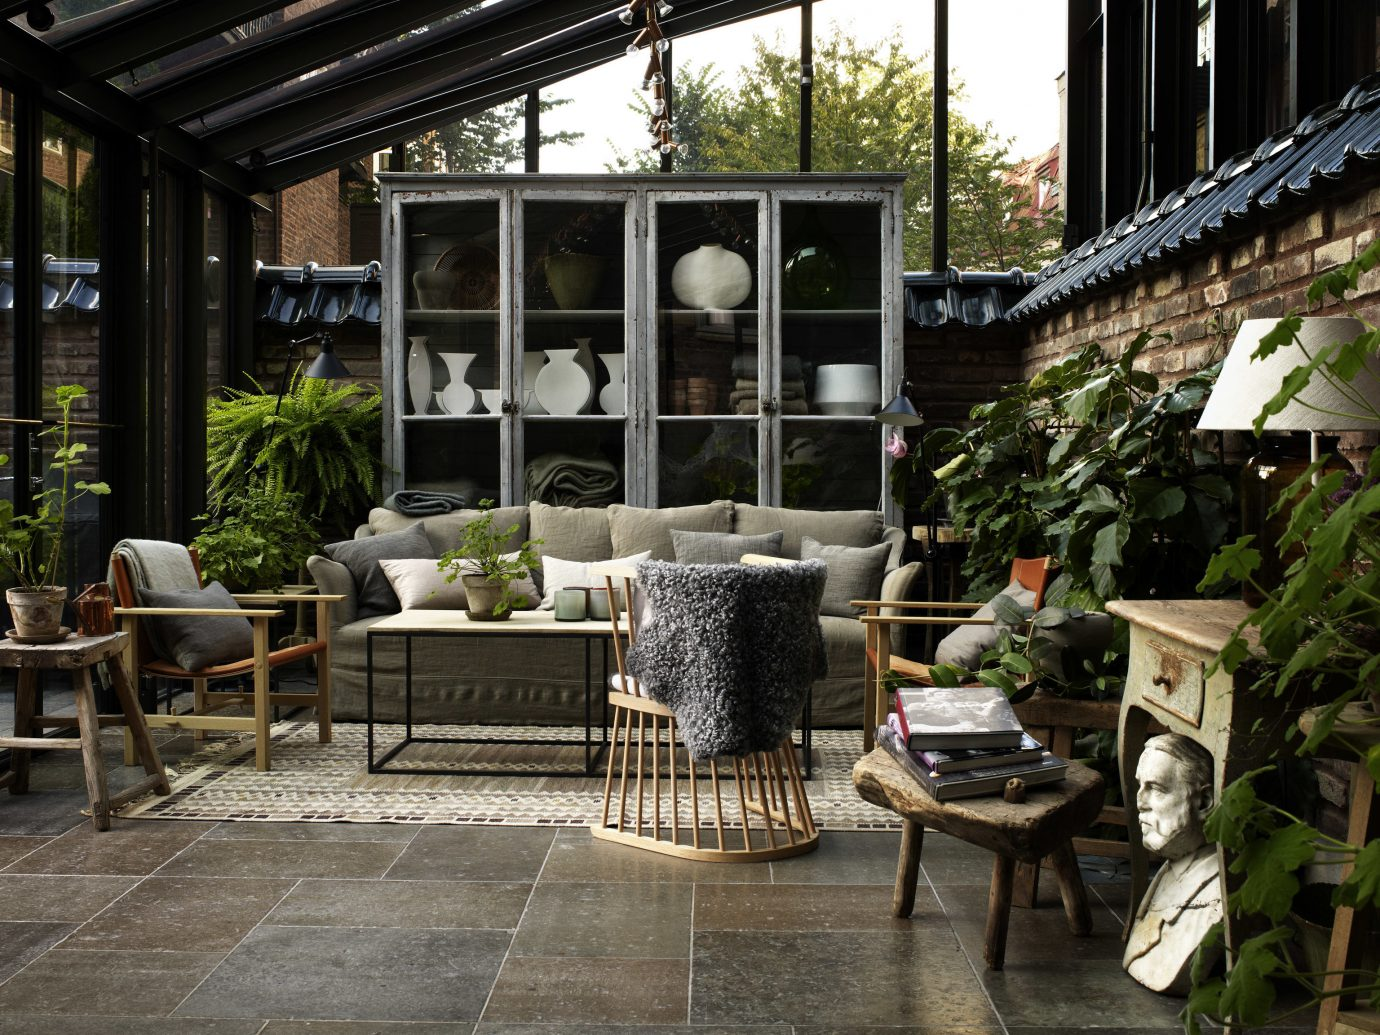 Design Hotels Stockholm Sweden building outdoor Patio Courtyard outdoor structure furniture plant window backyard interior design stone area